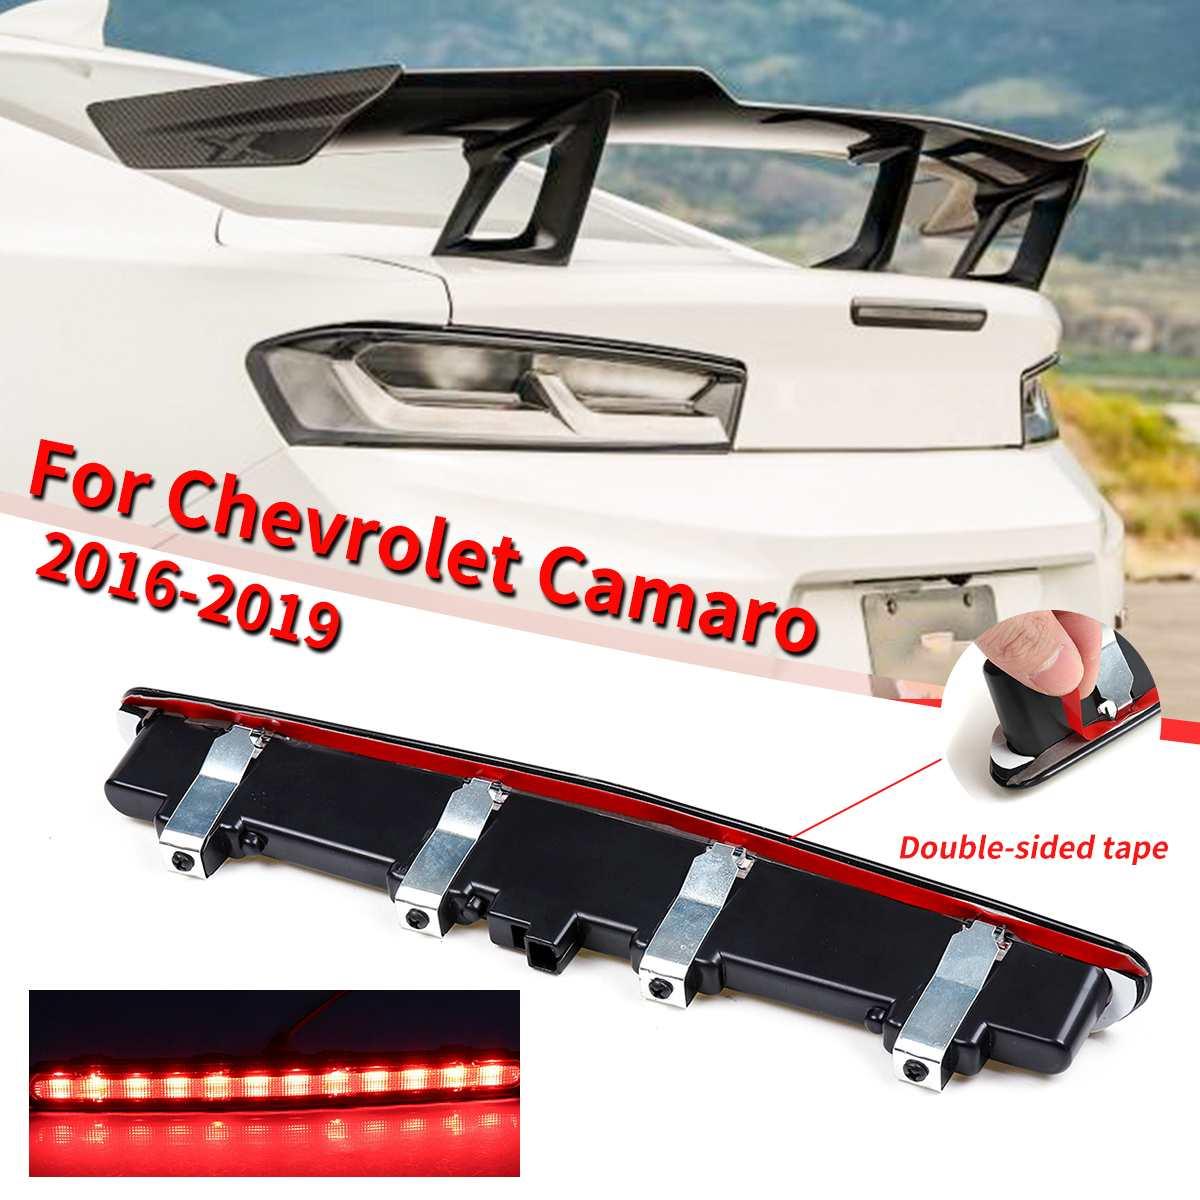 1 Pcs Gerookte Verduisterd Led Achter Red Derde 3rd Remlicht Lamp Abs Voor Chevrolet Camaro 2016-2019 Superieure Prestatie